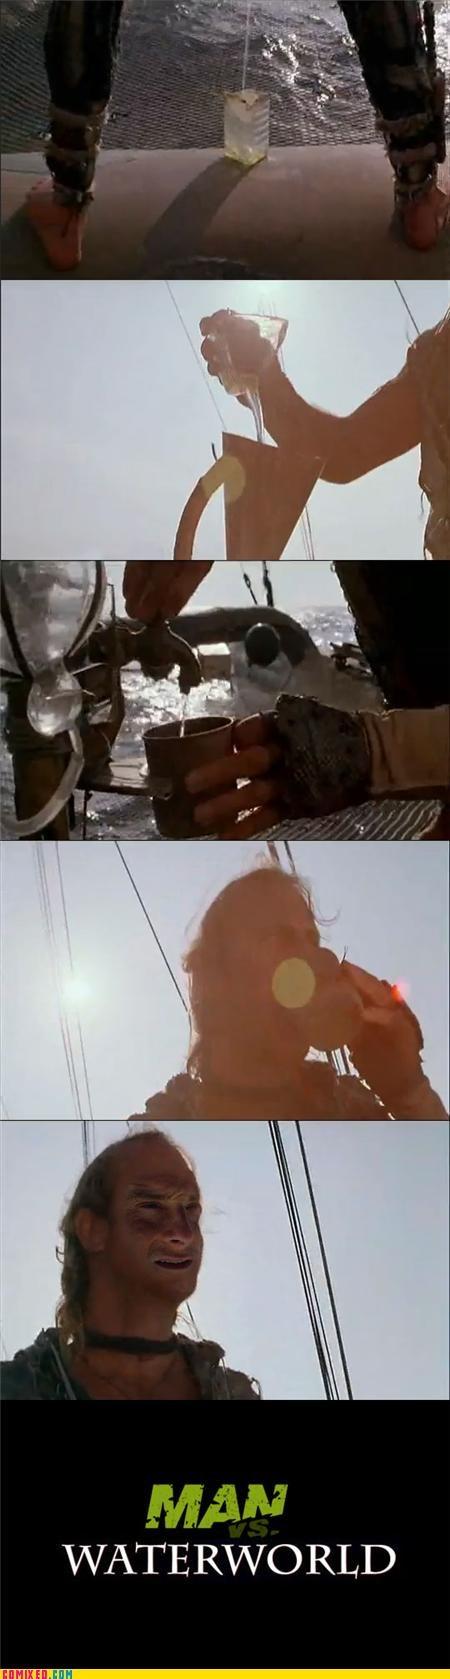 bear grylls kevin costner Movie waterworld - 4634457856